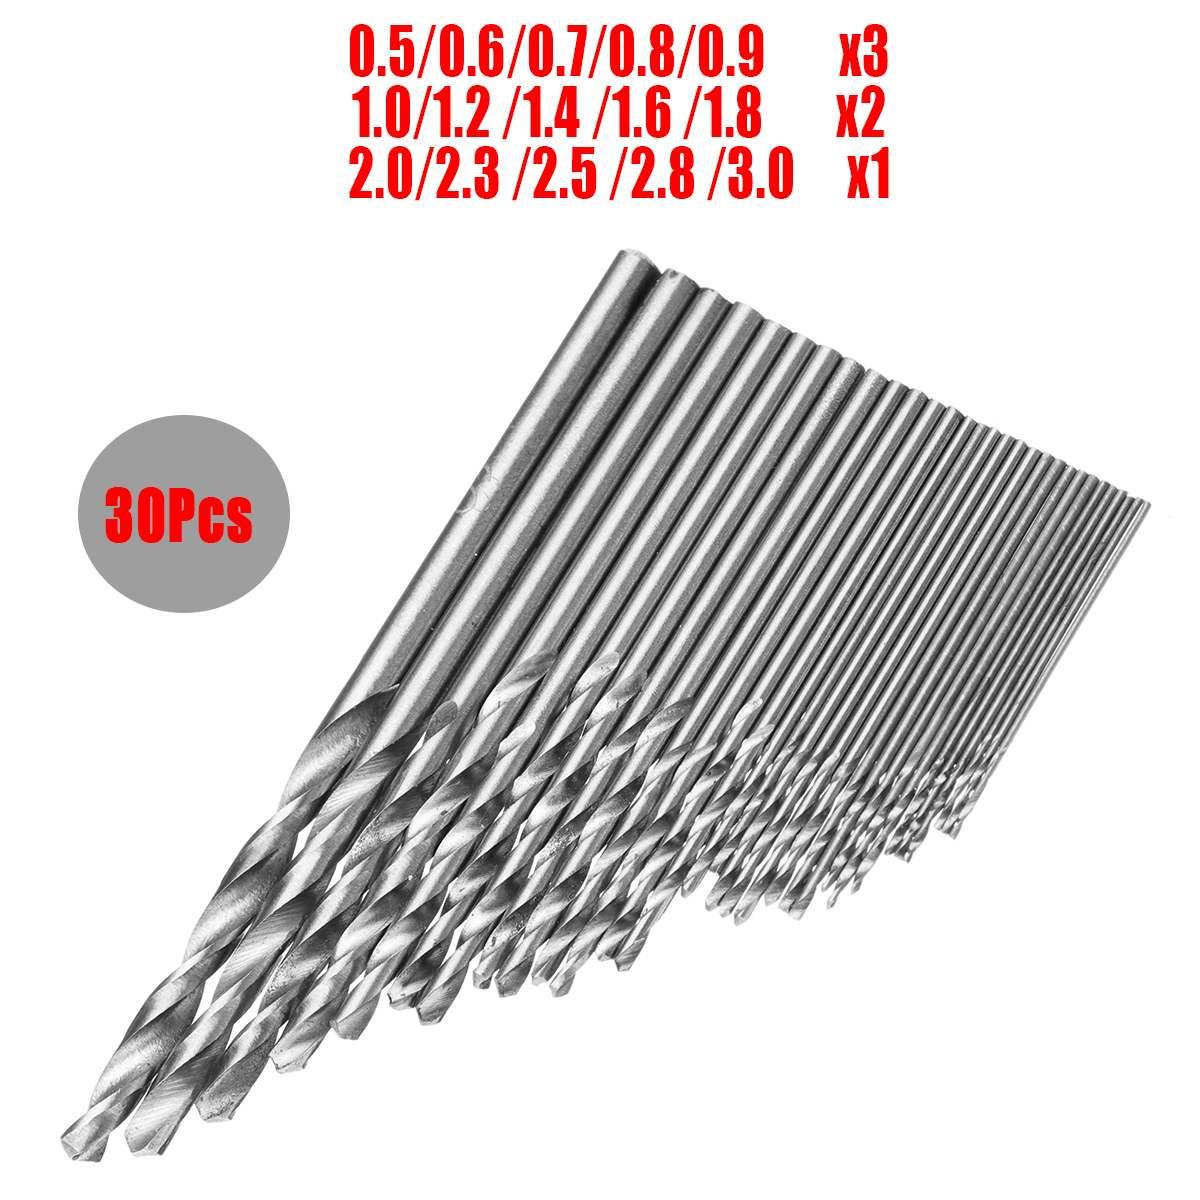 10Pcs Micro HSS 0.3-3mm Straight Shank Twist Drillings Bits Sets Tiny Durable LD